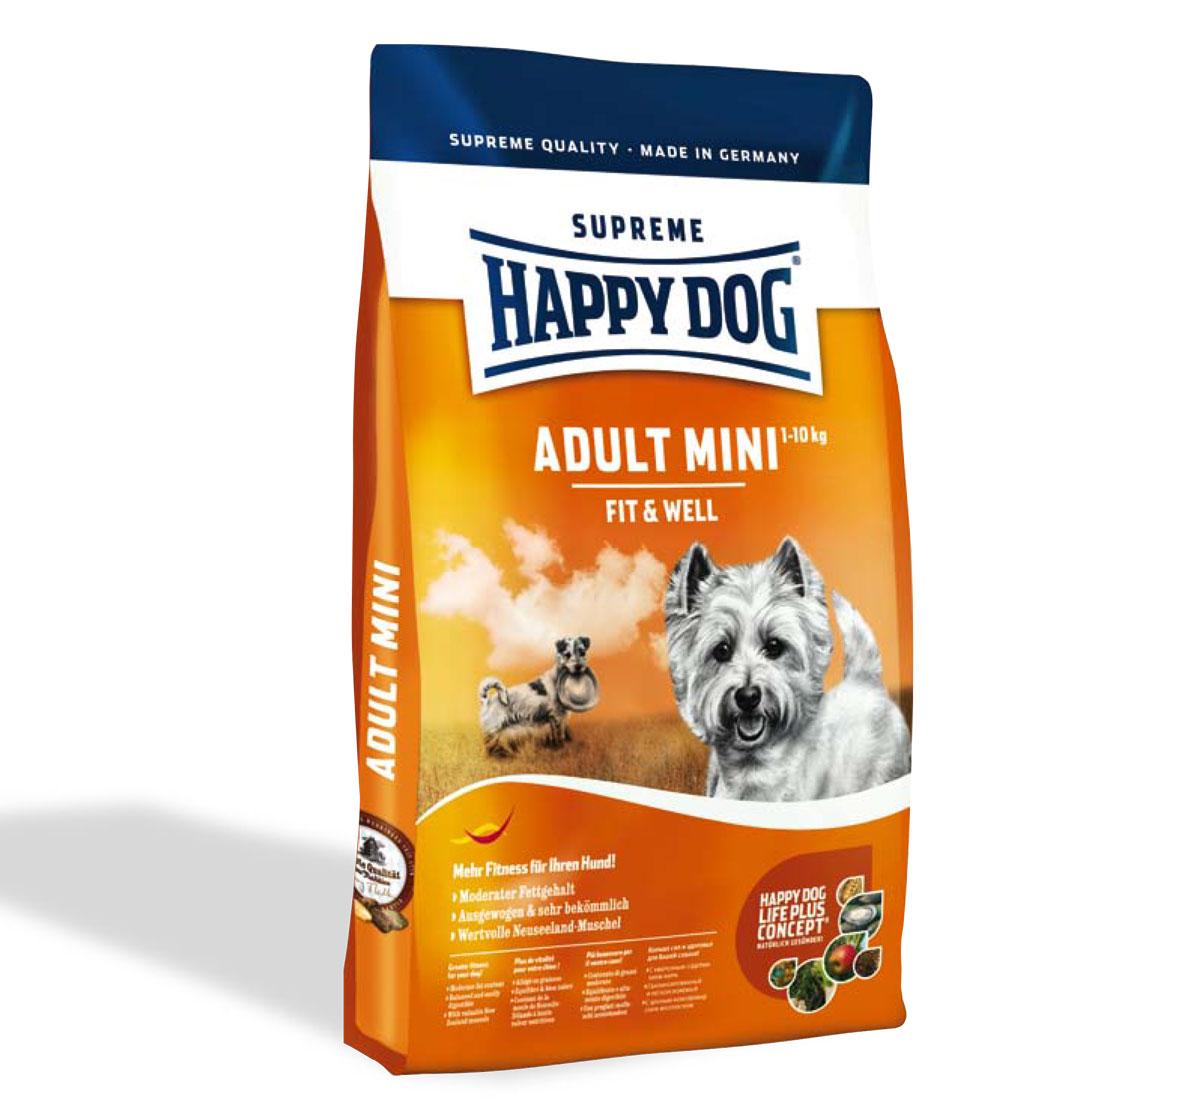 Happy Dog Mini Breed Adult Dog Food 4 Kg | DogSpot ... - photo#38